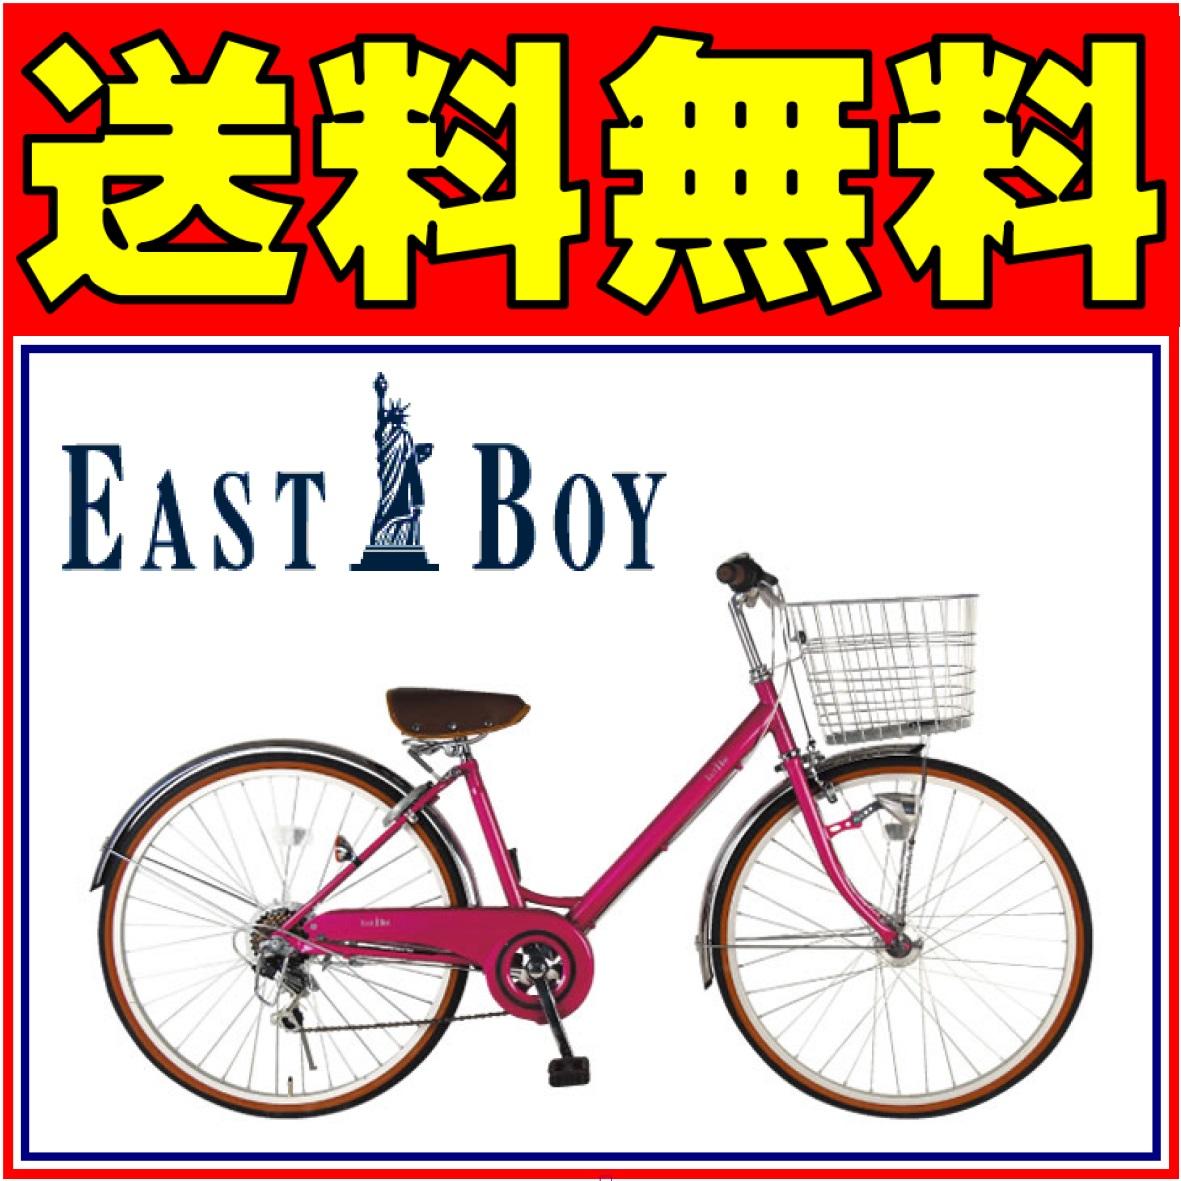 EASTBOY イーストボーイ自転車 シティサイクル チェリーピンク 女子高生、女子中学生の通学に最適 カジュアルシティ 外装6段ギア シティ車 26インチ 鍵付き LEDオートライト イーストボーイ 自転車 女子